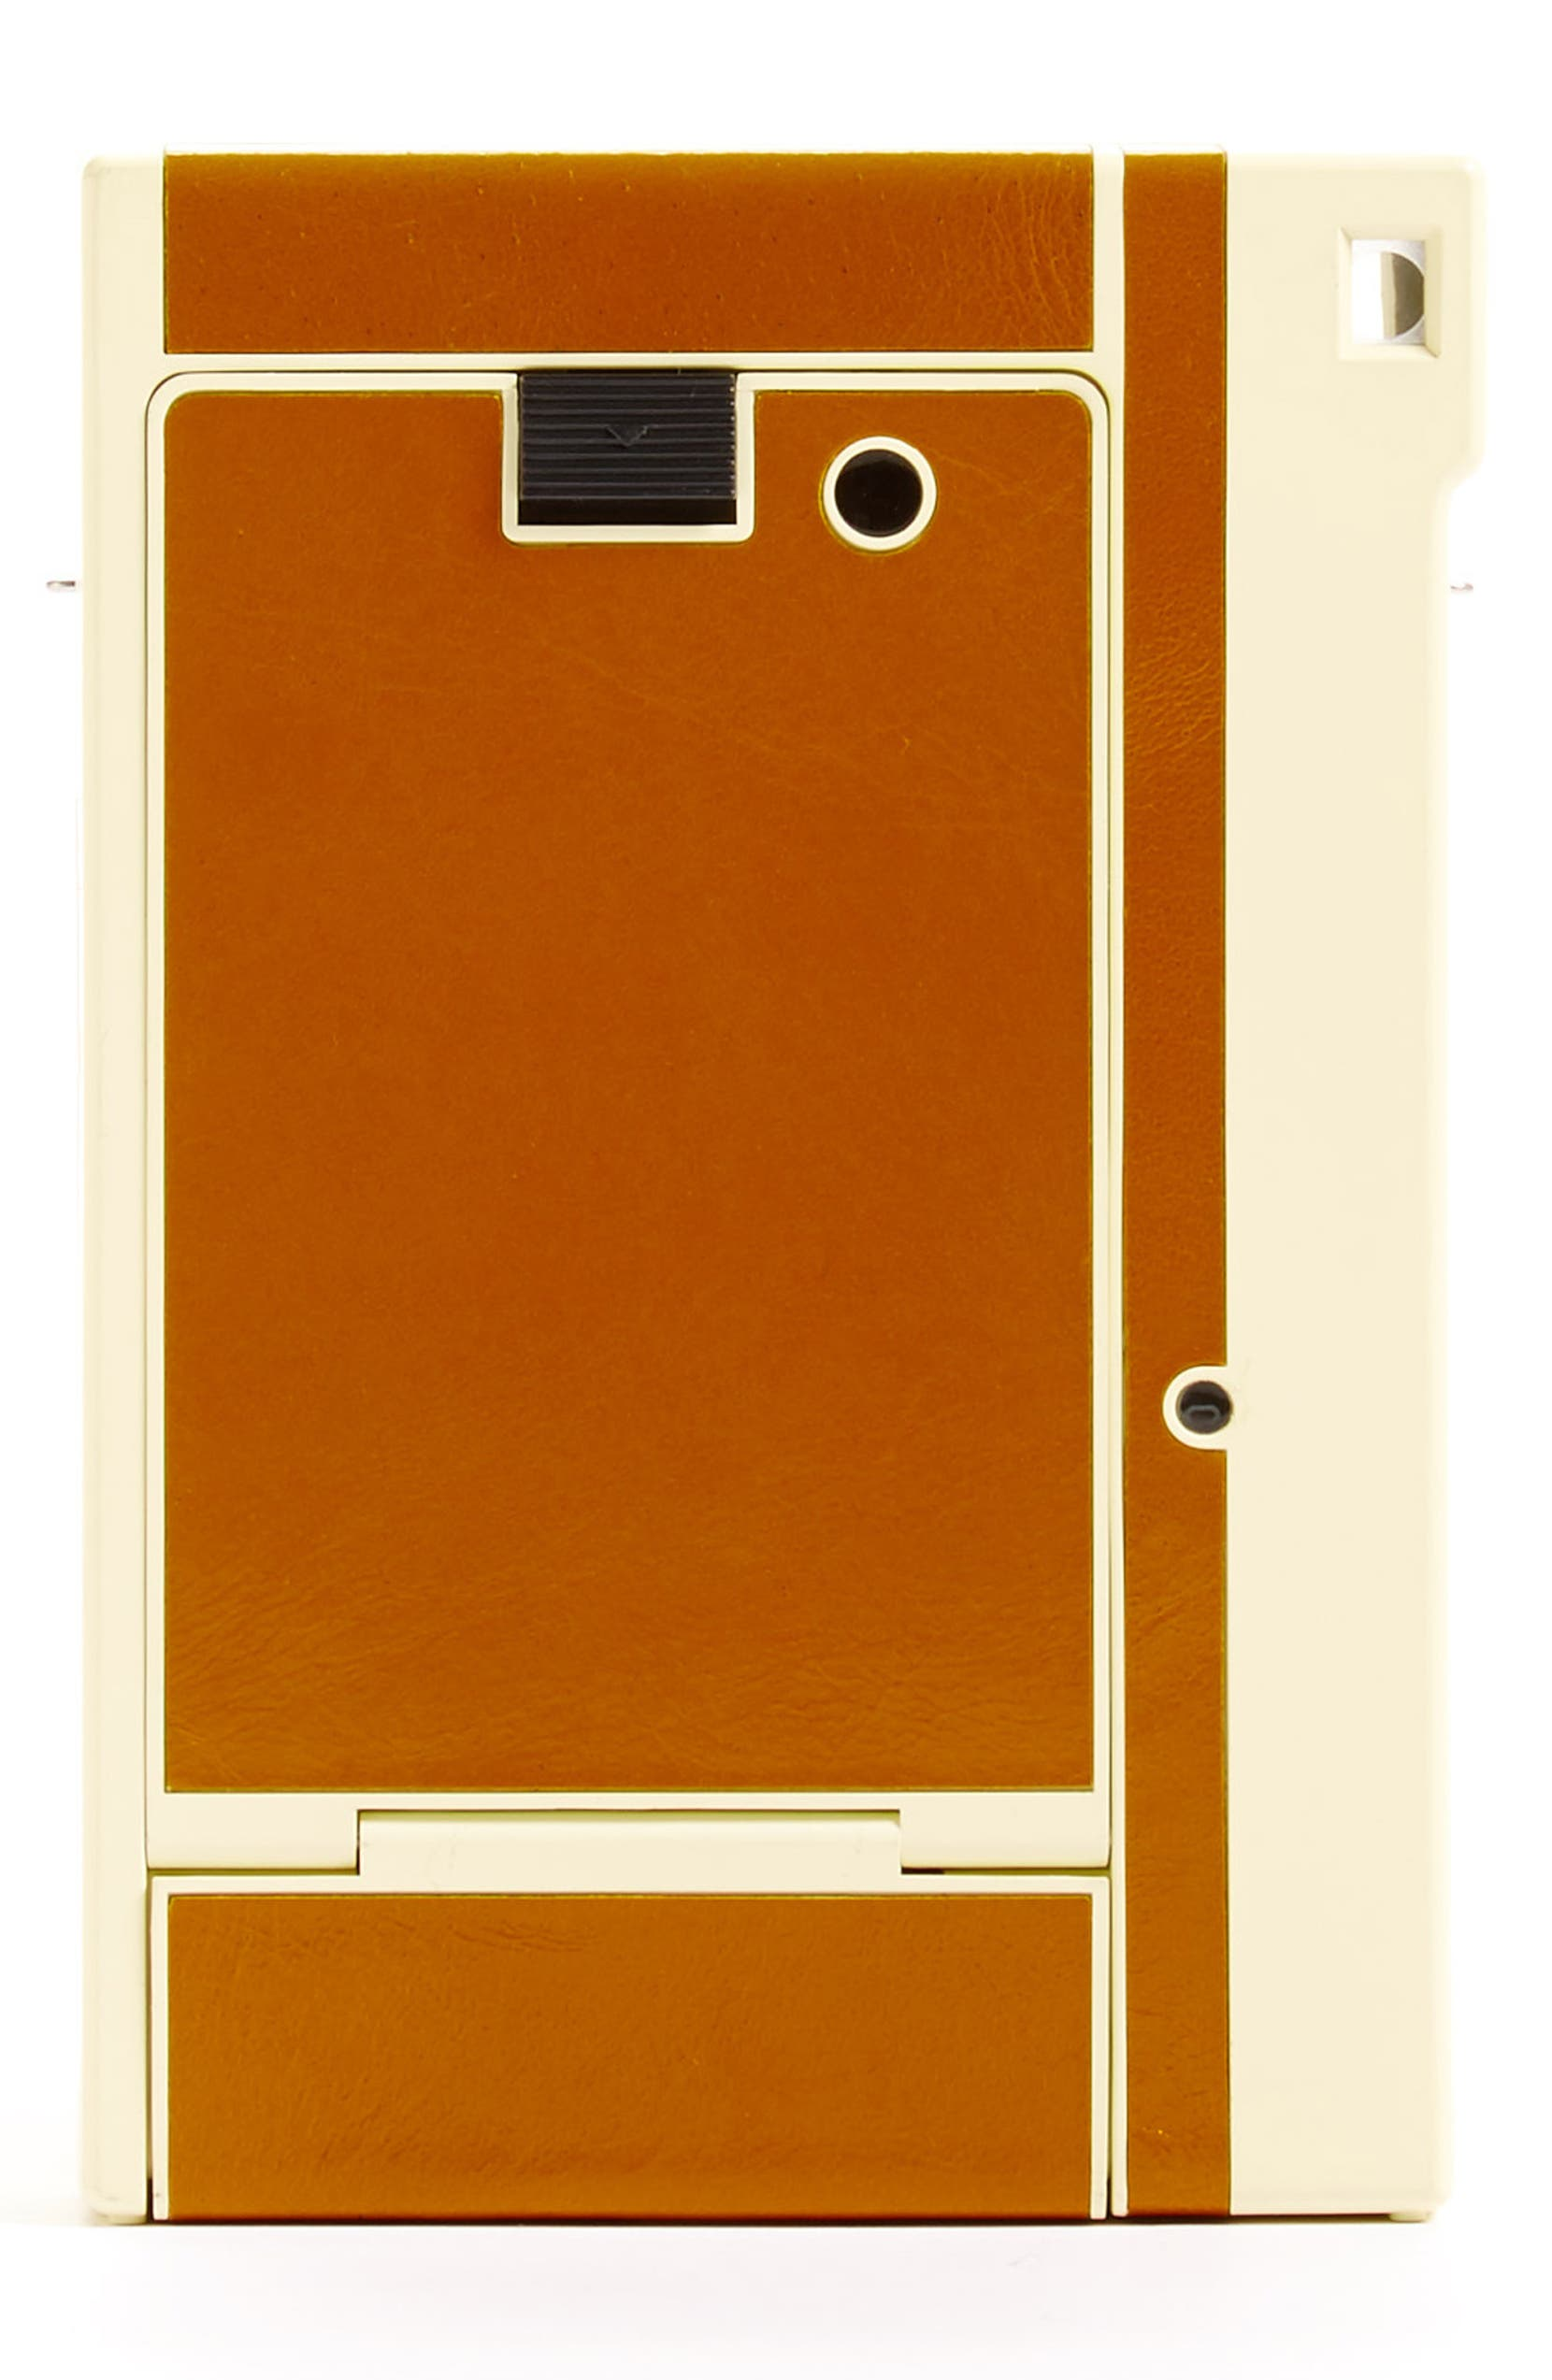 Lomography Lomoinstant Mini Sanremo Camera Nordstrom Instant Edition